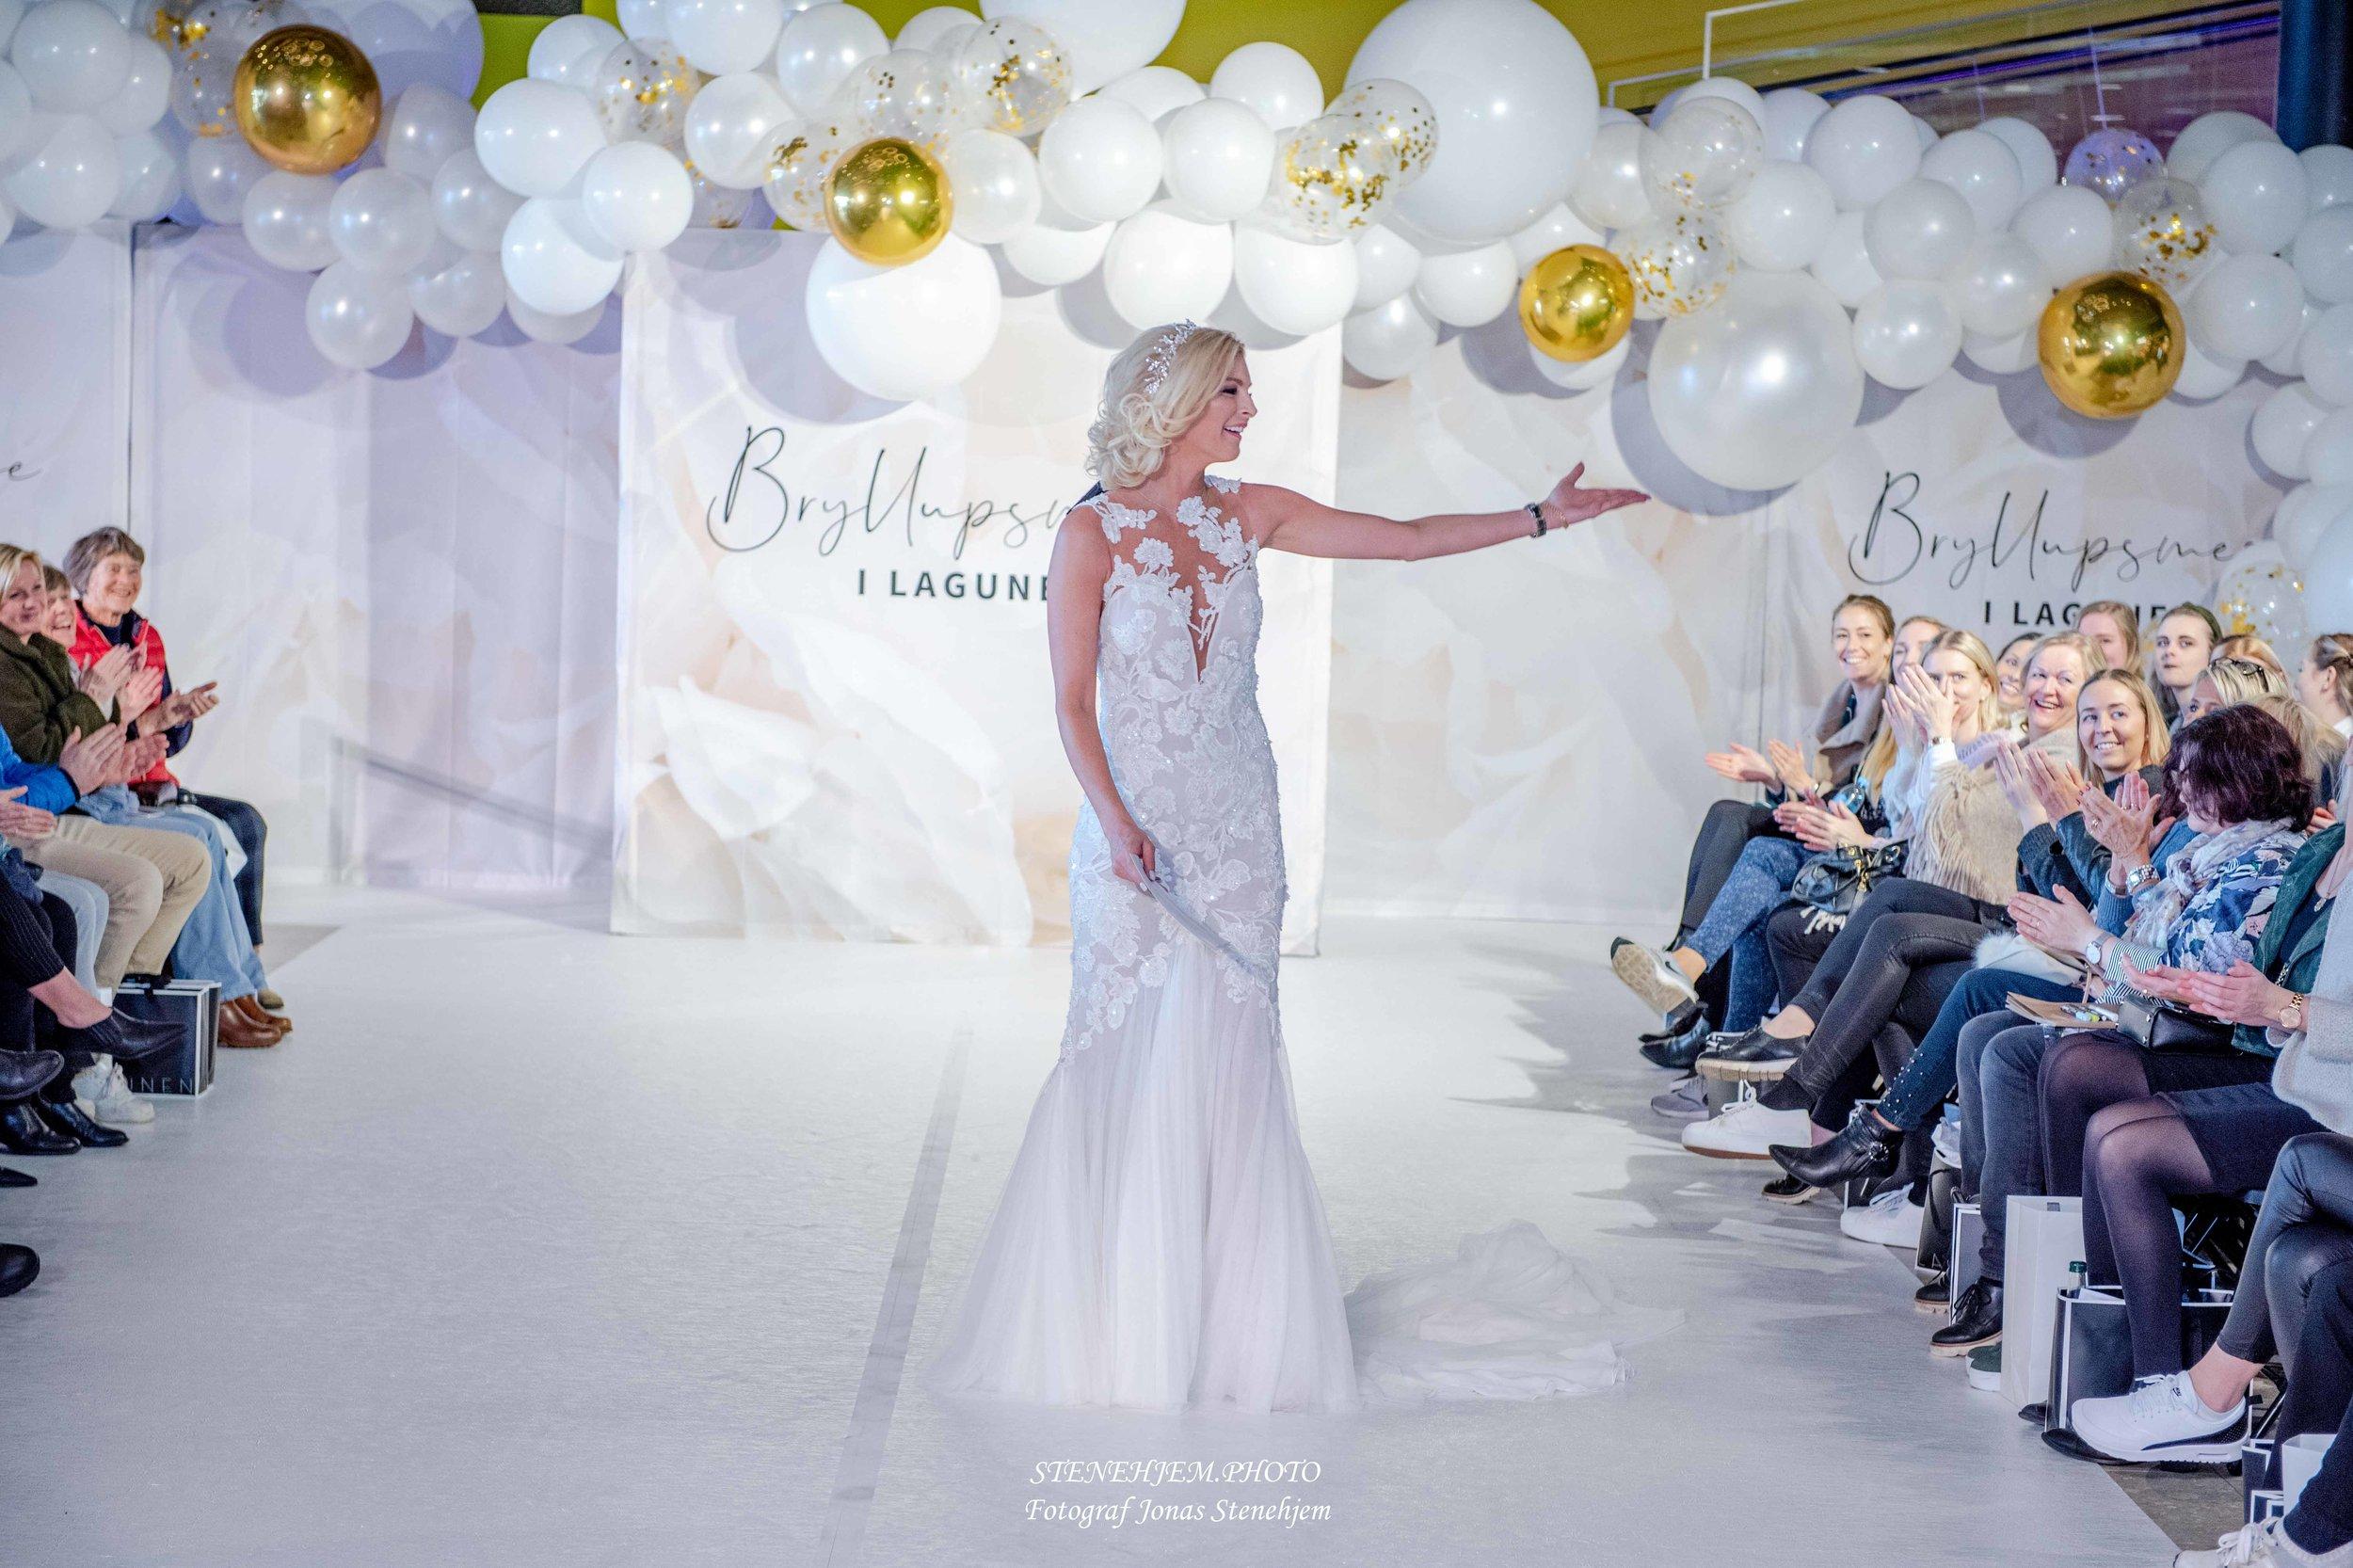 Bryllupsmesse_Lagunen_mittaltweddingfair__040.jpg